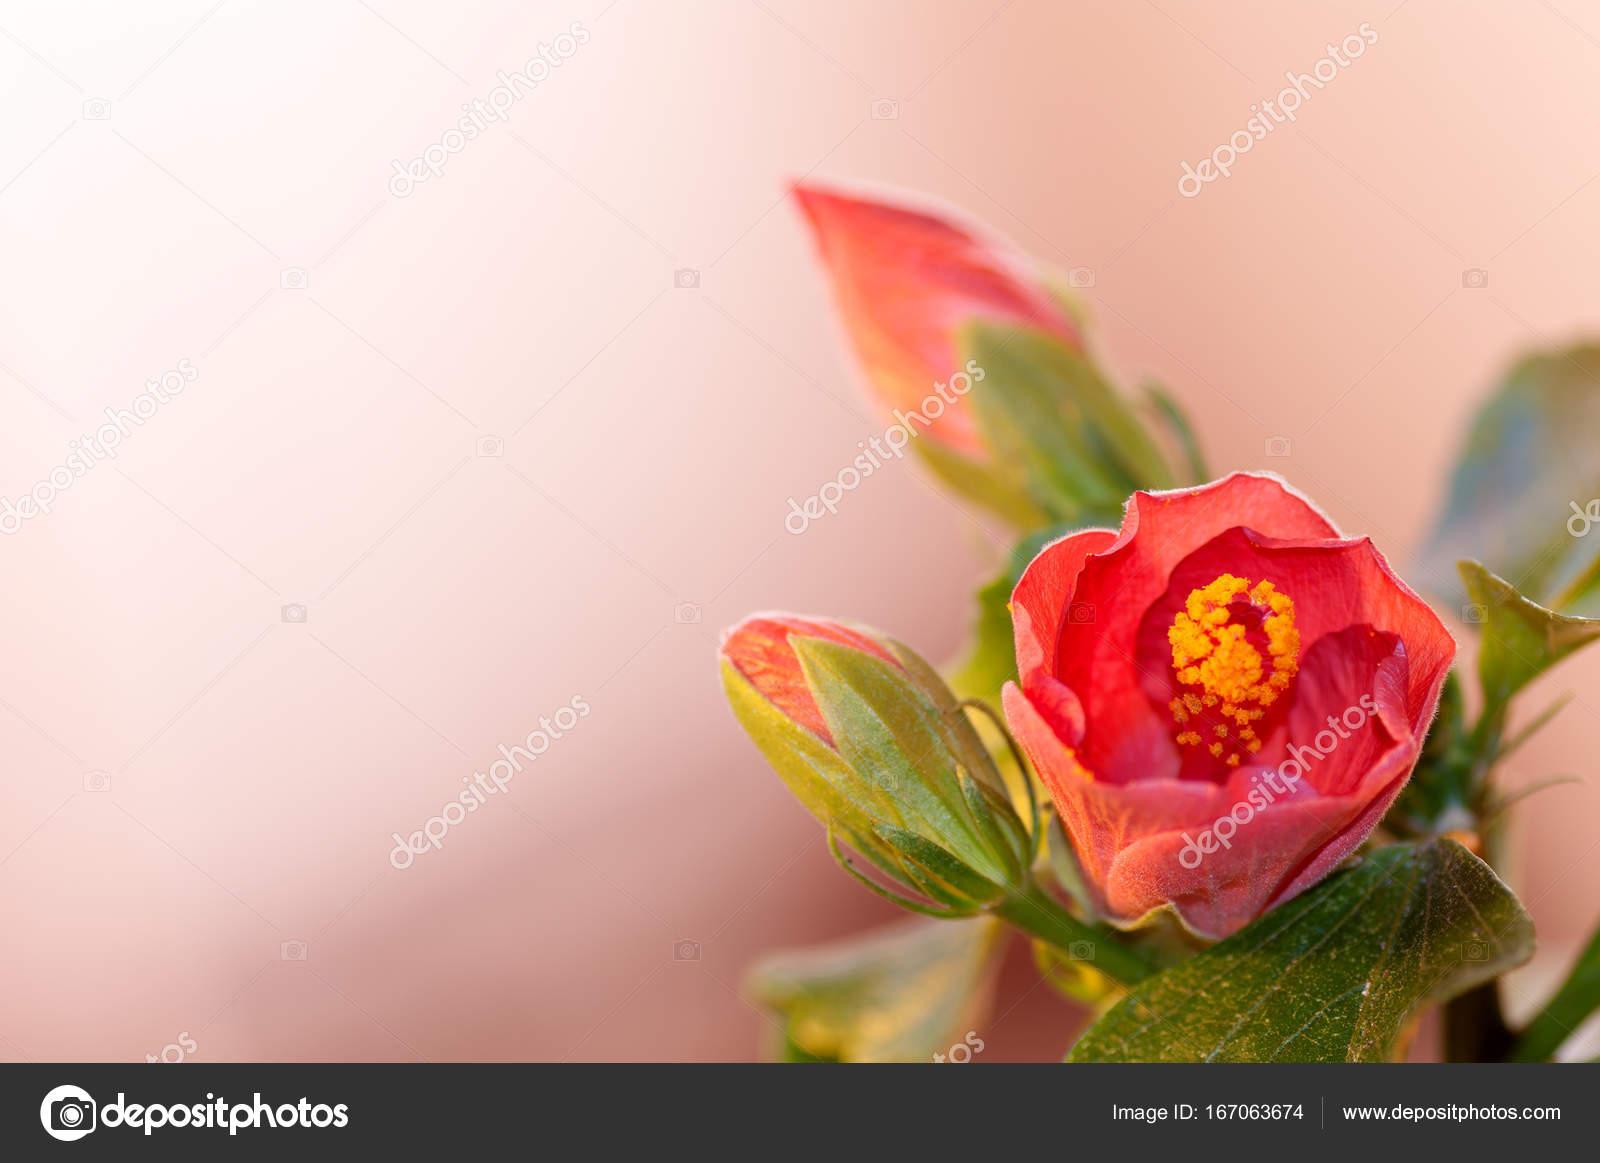 Hibiscus flower red studio stock photo tanchic 167063674 hibiscus flower red studio stock photo izmirmasajfo